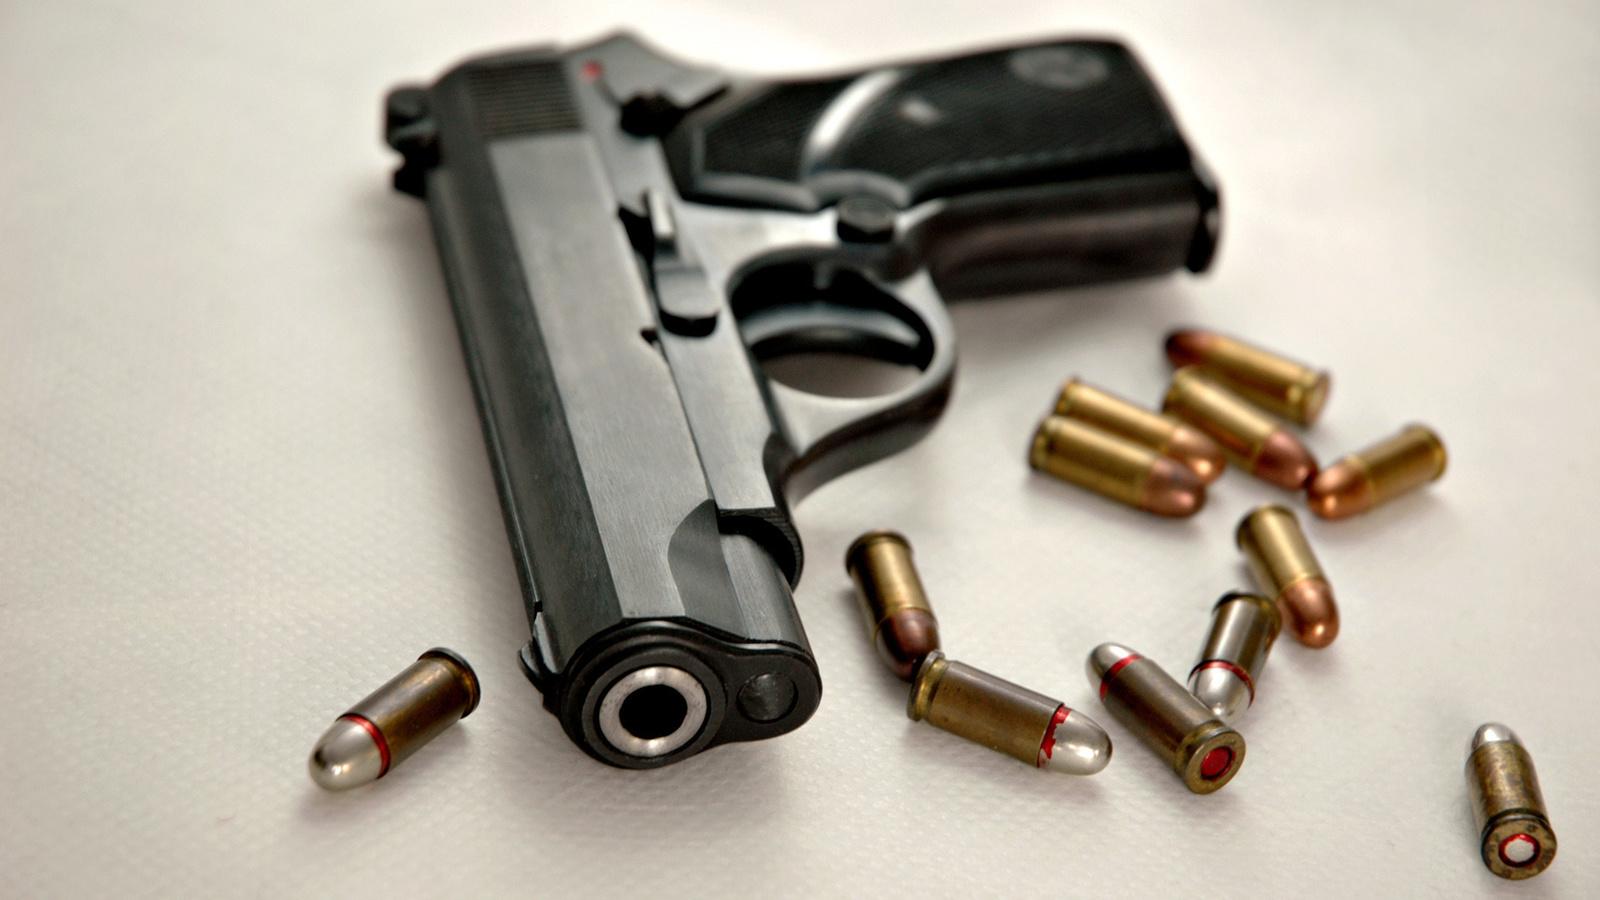 пуля, Пистолет, 9мм, патроны